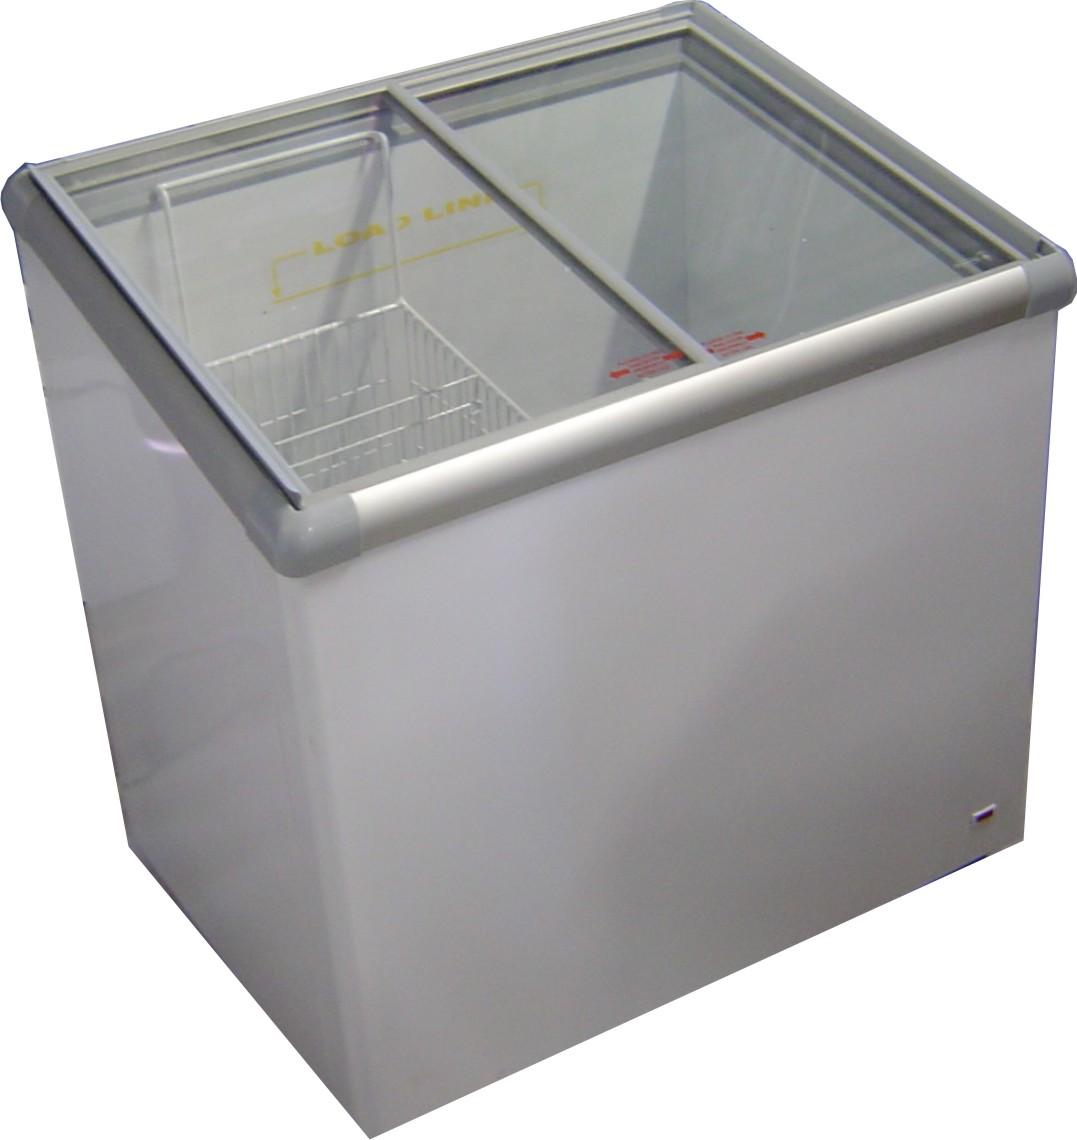 Fridge Star Model Vi202 L Glass Top Ice Cream Freezer